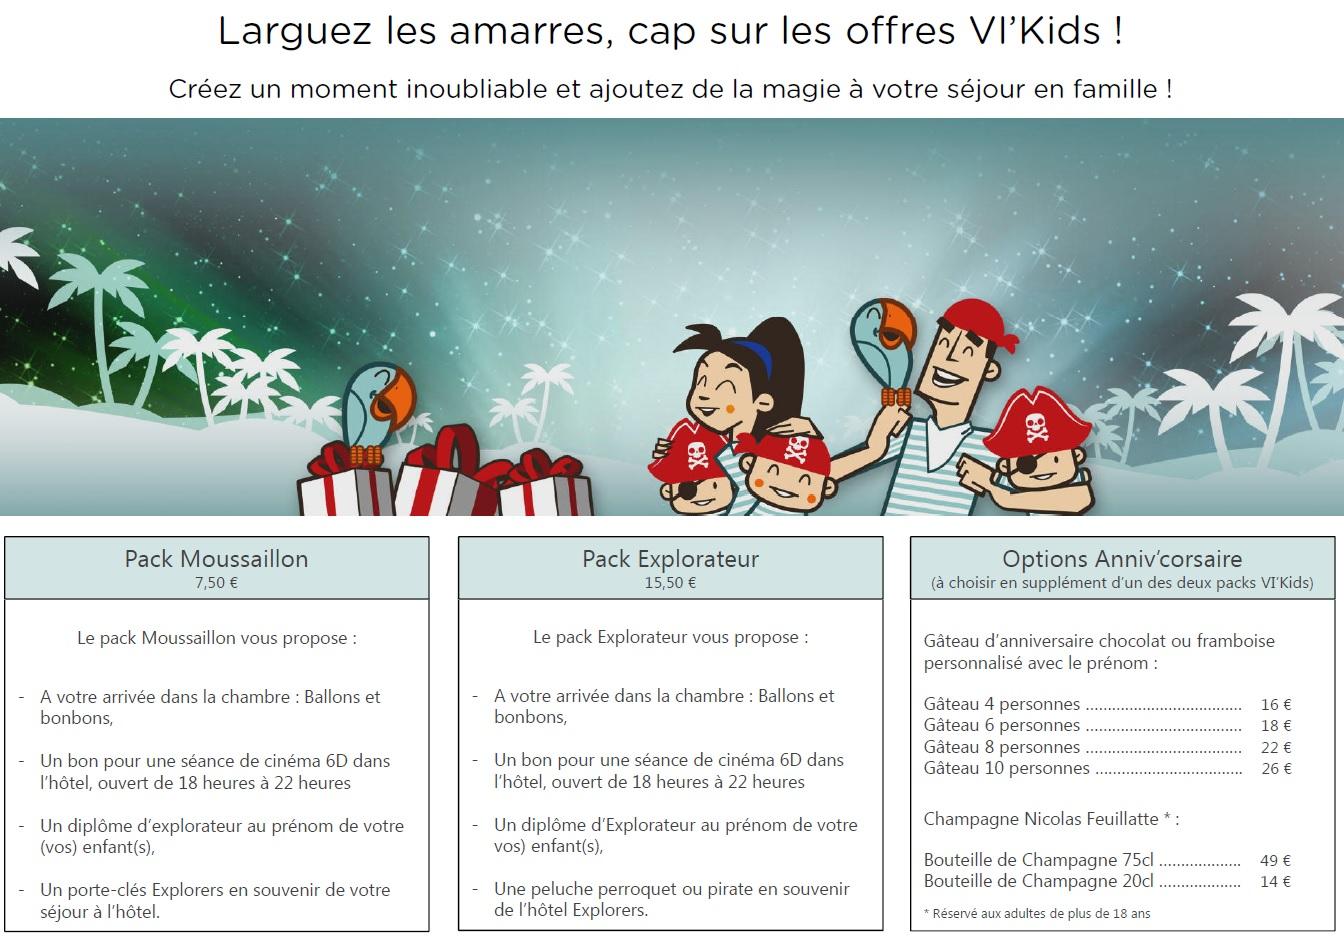 presentation-des-offres-vikids